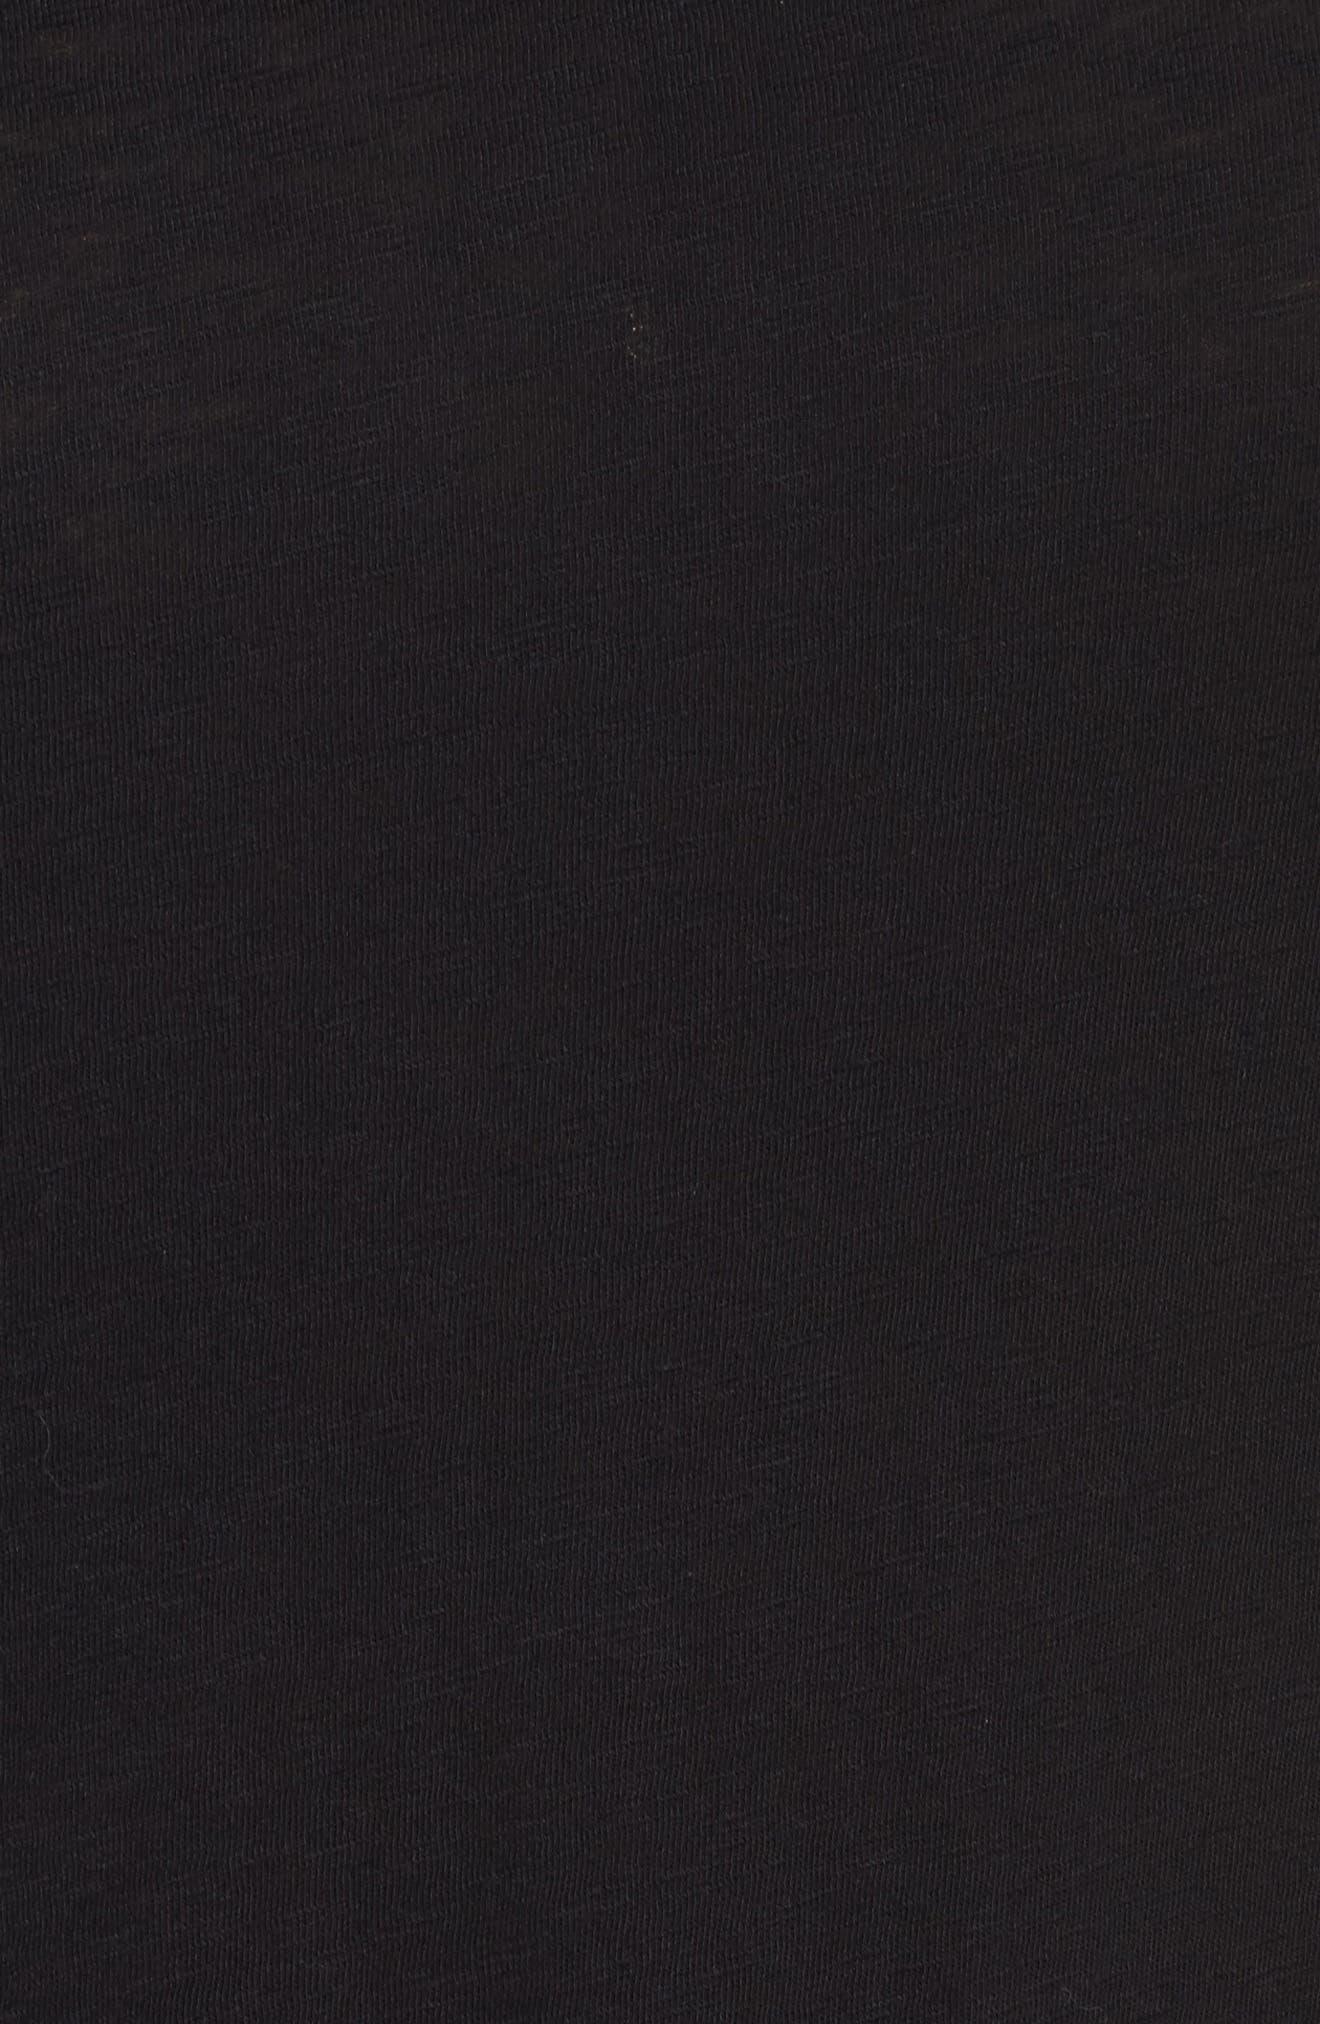 Long Sleeve Crewneck Tee,                             Alternate thumbnail 33, color,                             Black